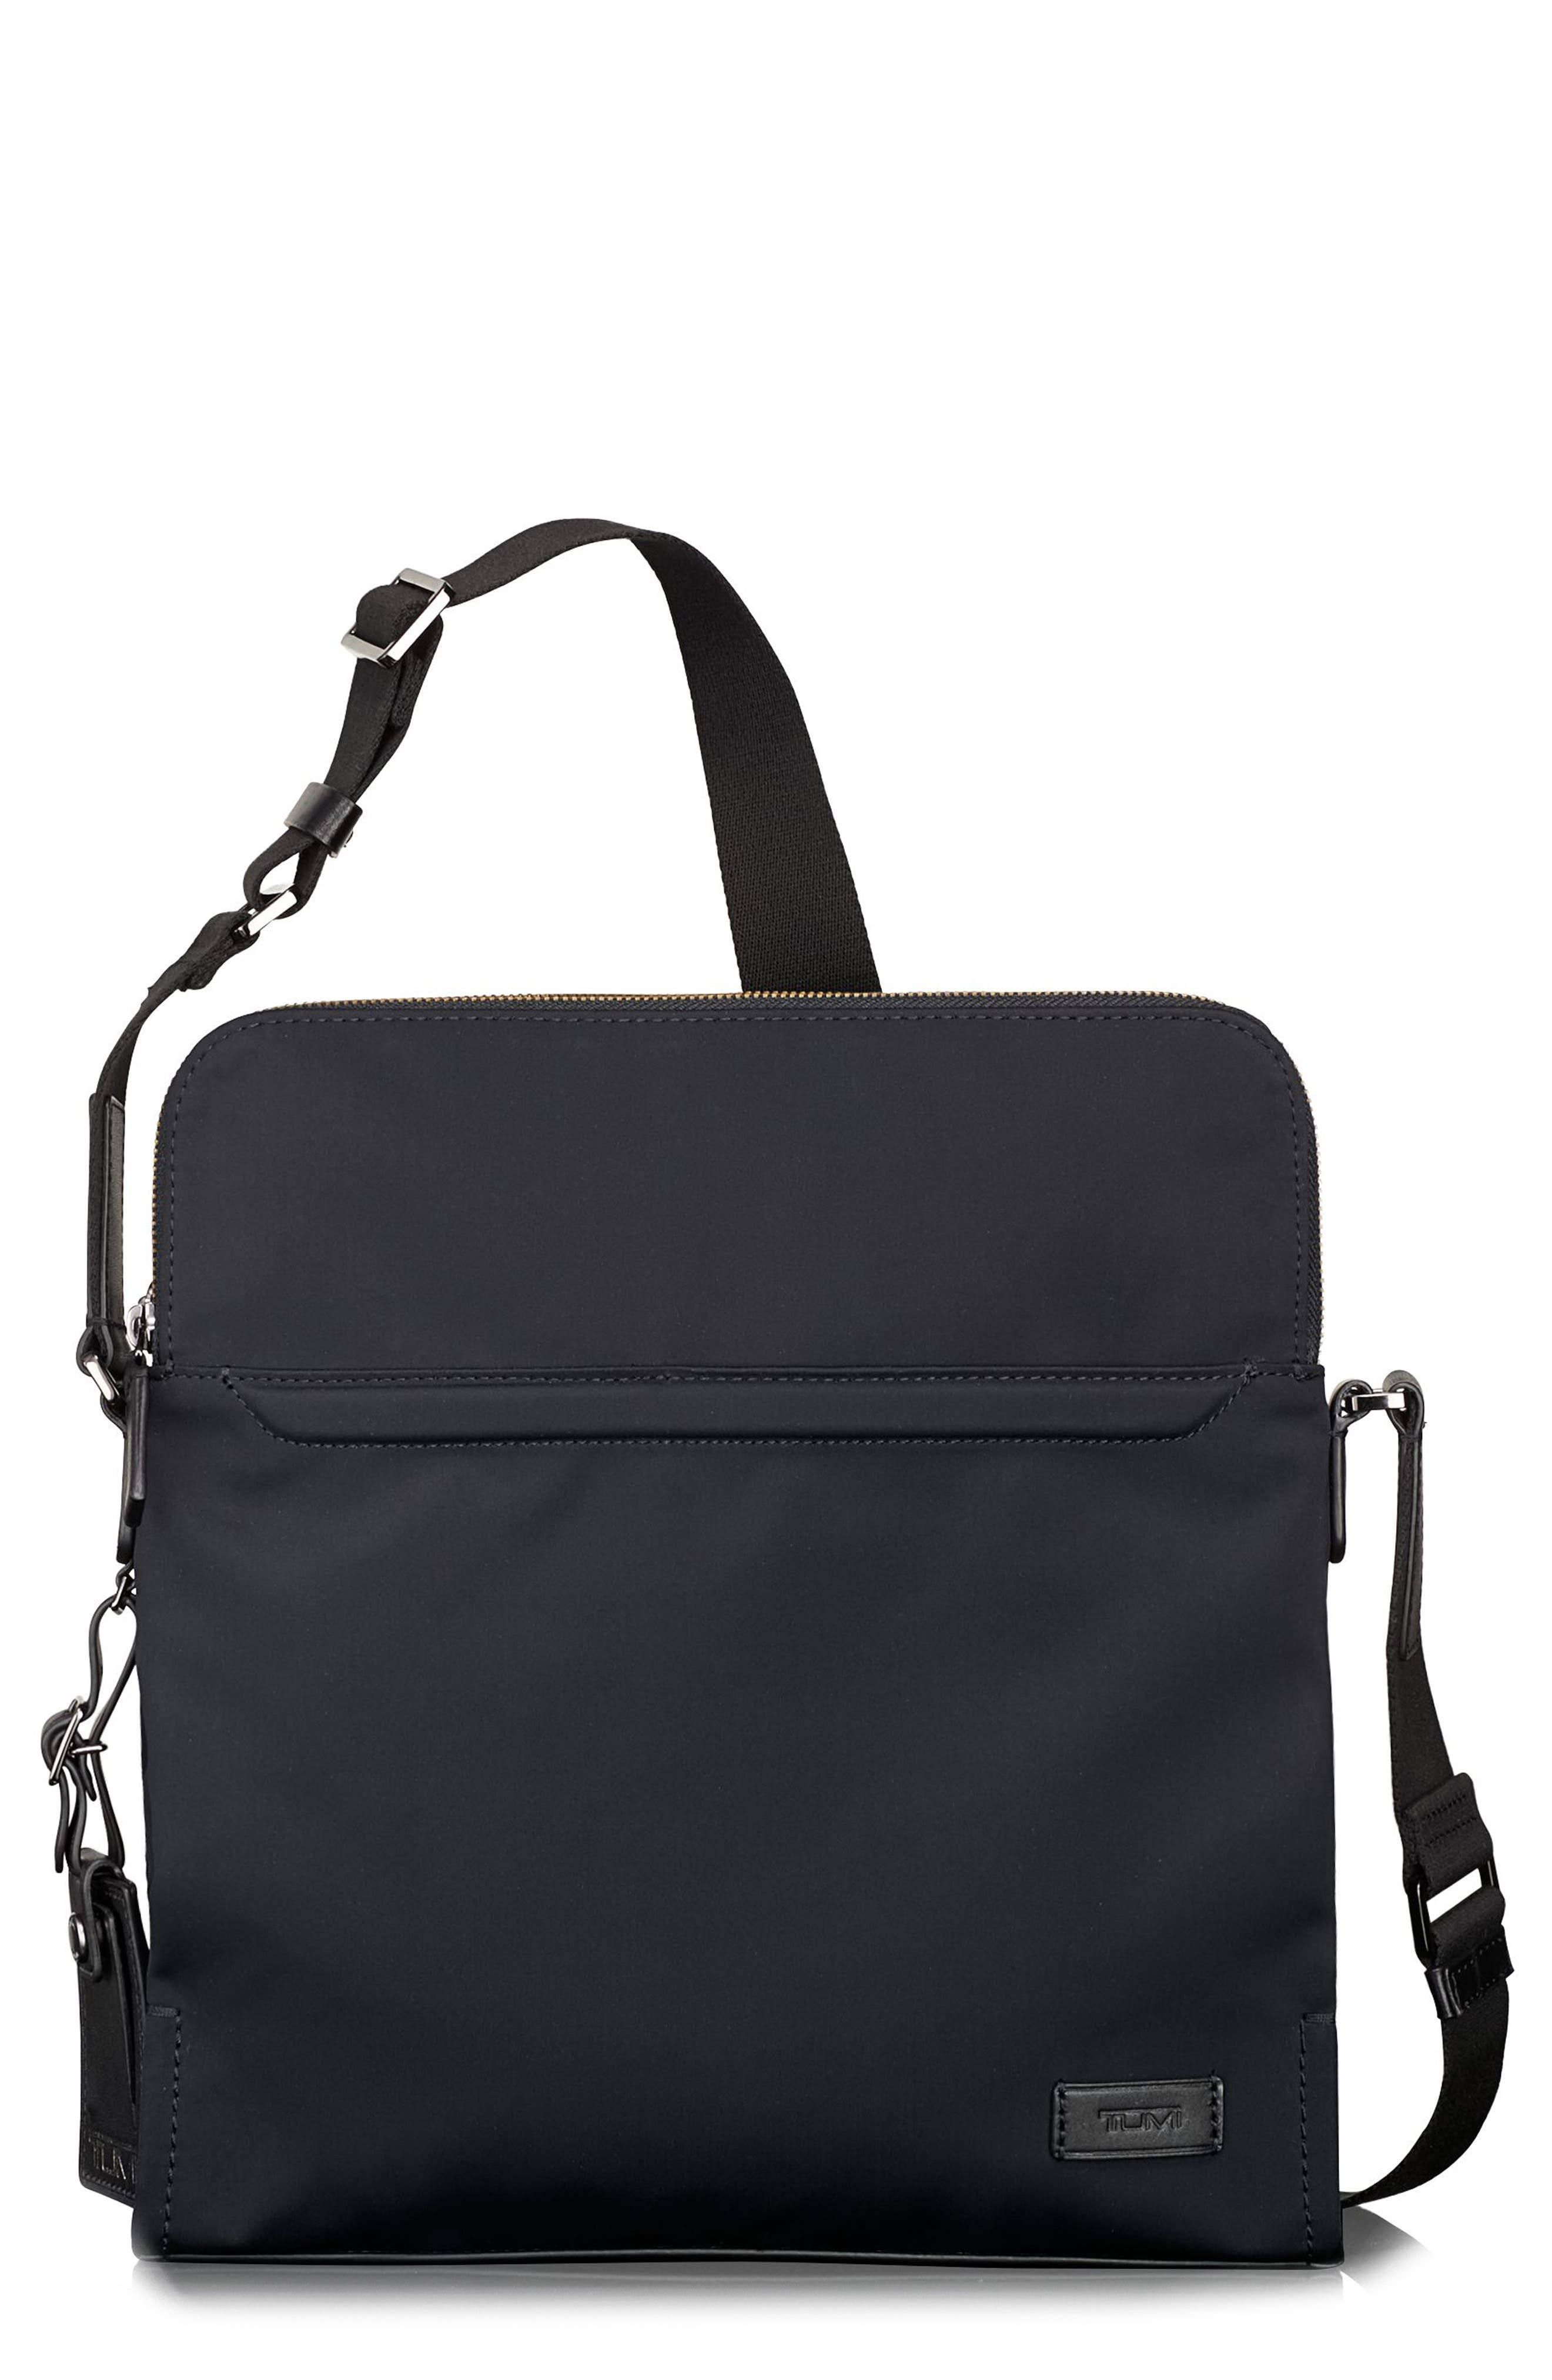 Harrison Stratton Messenger Bag,                             Main thumbnail 1, color,                             Black Nylon